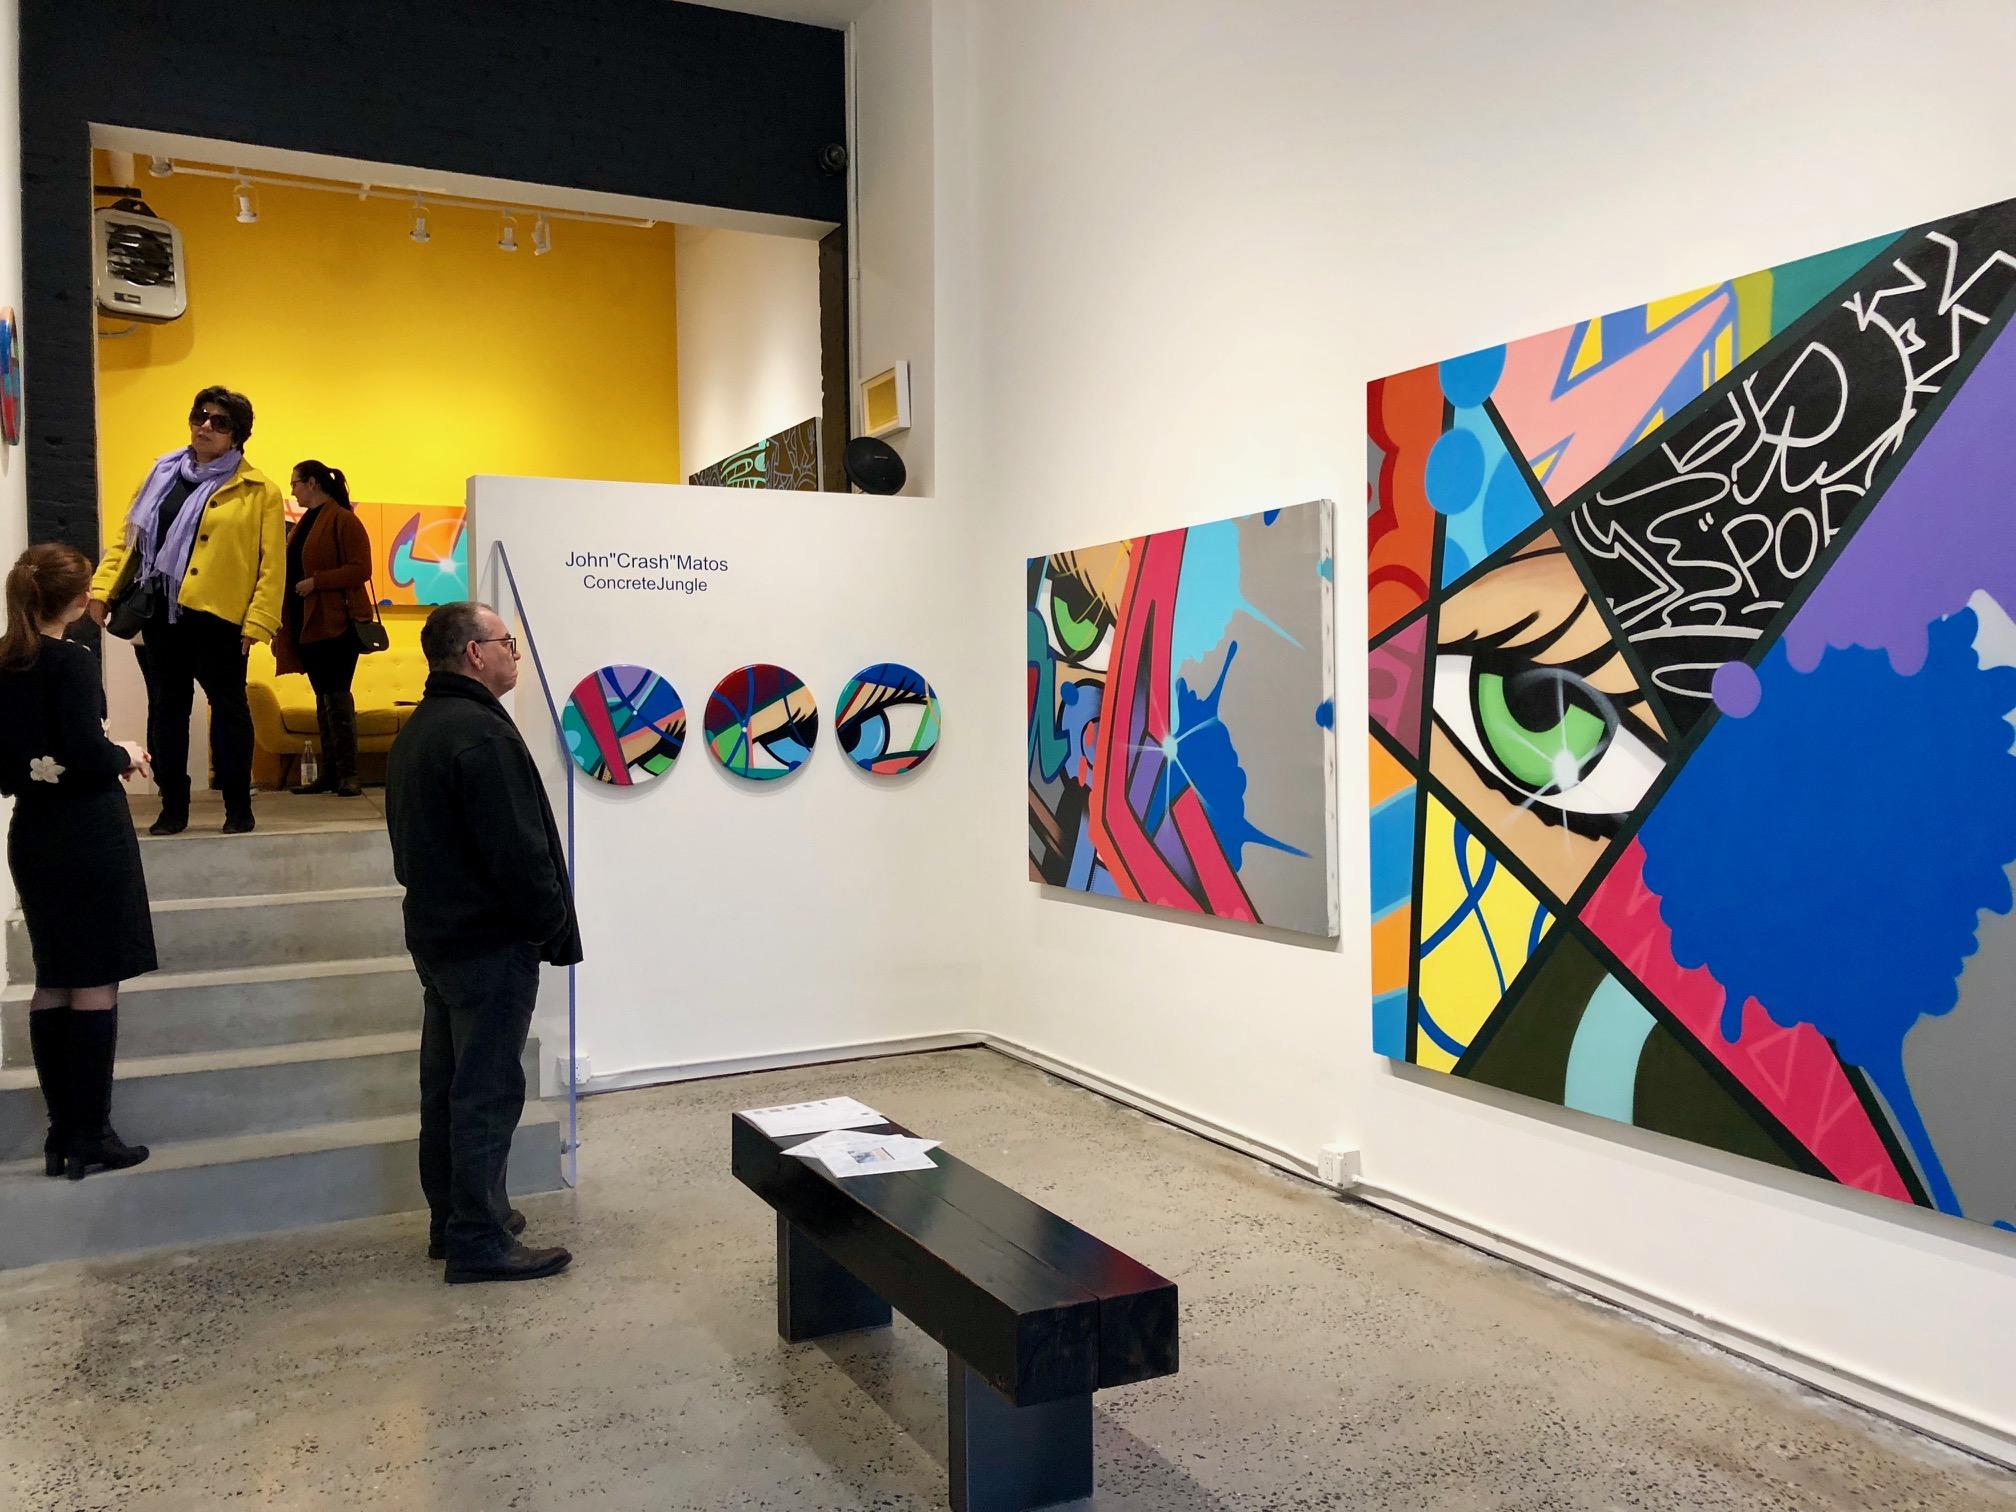 Joanne Artman Gallery, Chelsea, NY, Artwork by Crash, photograph by Amie Potsic copyright 2018